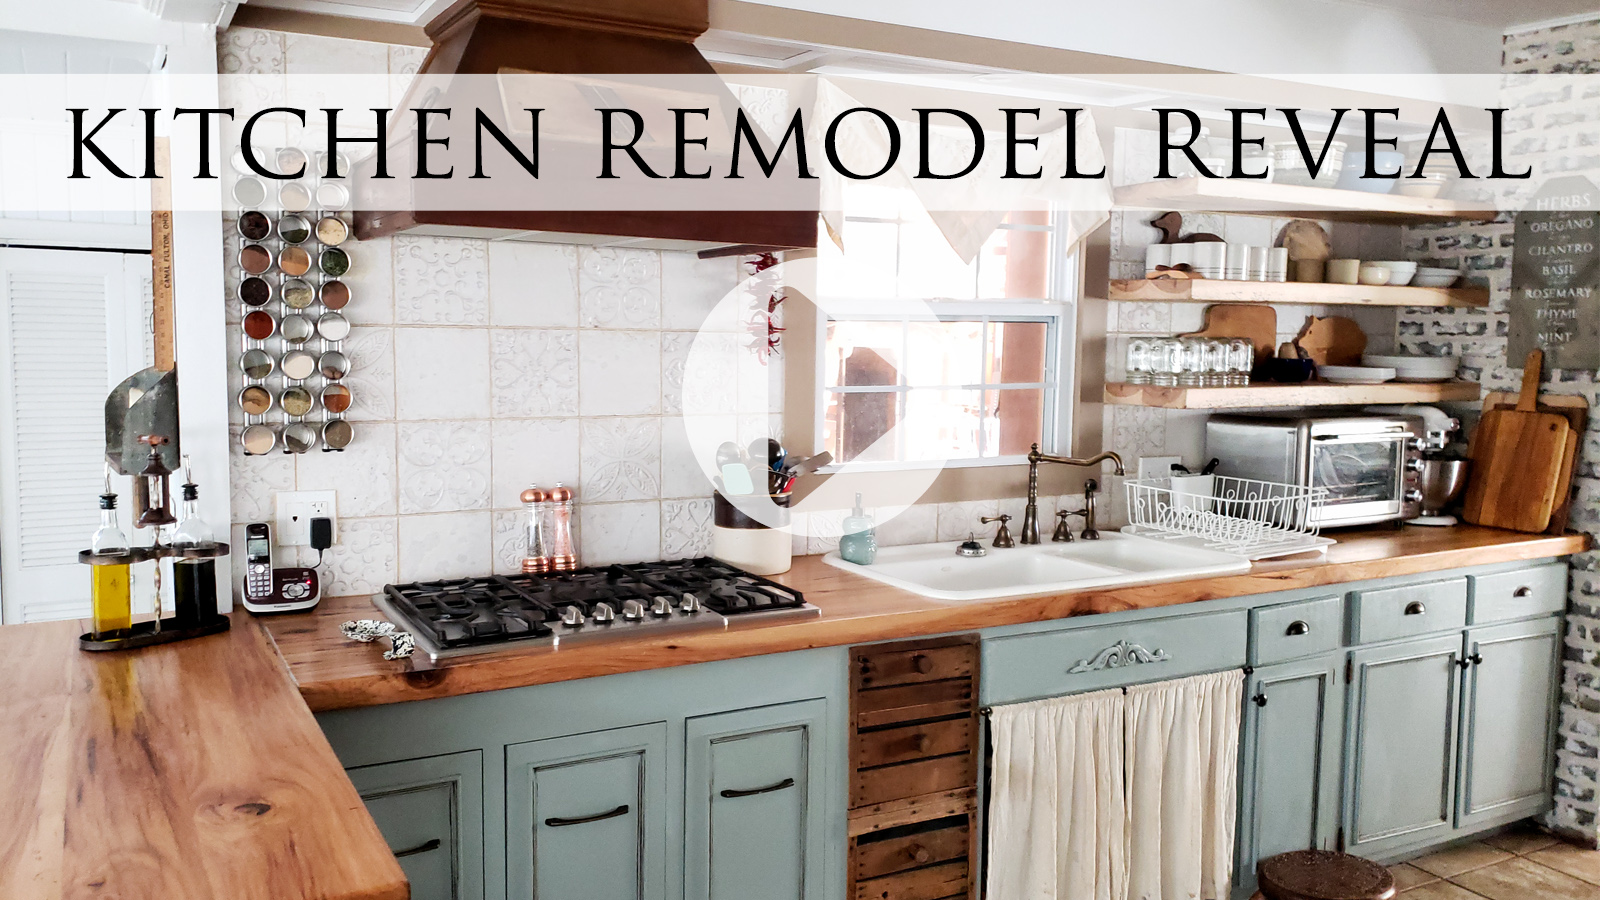 Video Tour of Larissa of Prodigal Pieces Farmhouse Kitchen Remodel Reveal | prodigalpieces.com #prodiaglpieces